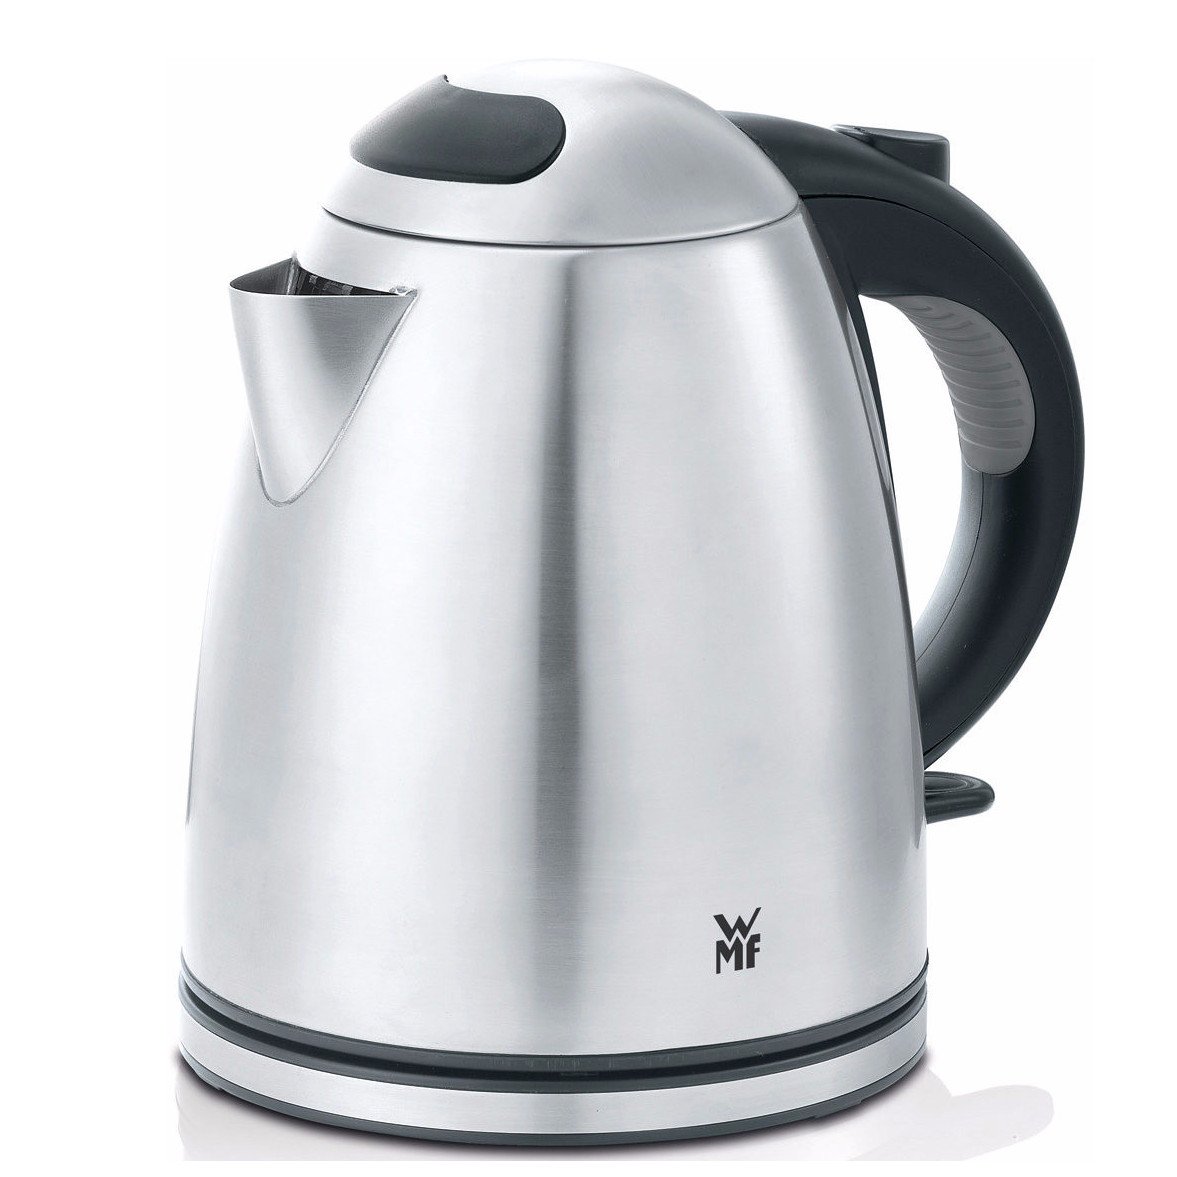 WMF stelio不锈钢电热水壶